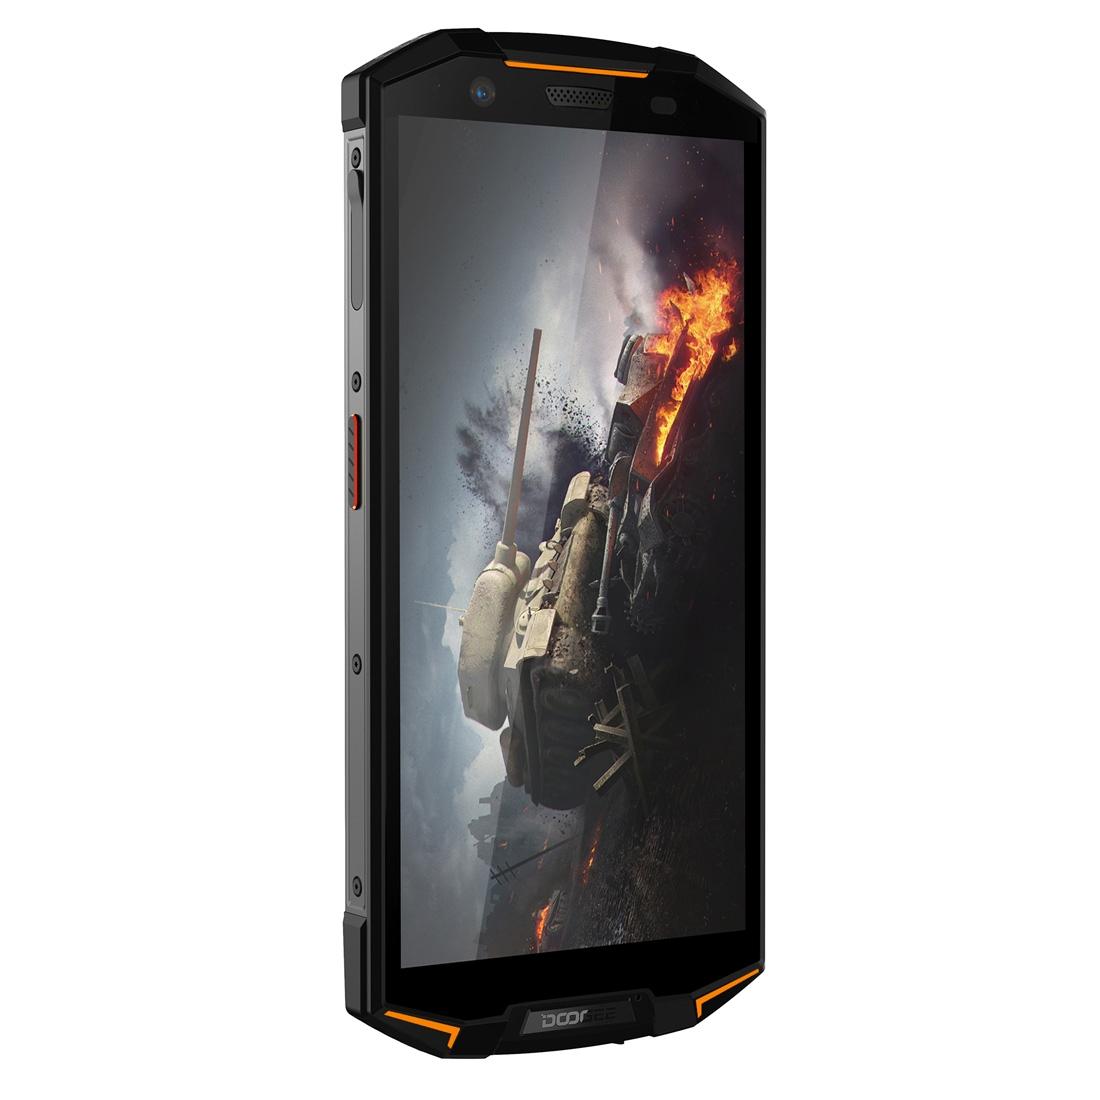 Смартфон DOOGEE S70 6GB+64GB Защита от влаги пыли ударов по стандарту IP68/IP69K MIL-STD-810G 5500мАч батарея Двойная камера